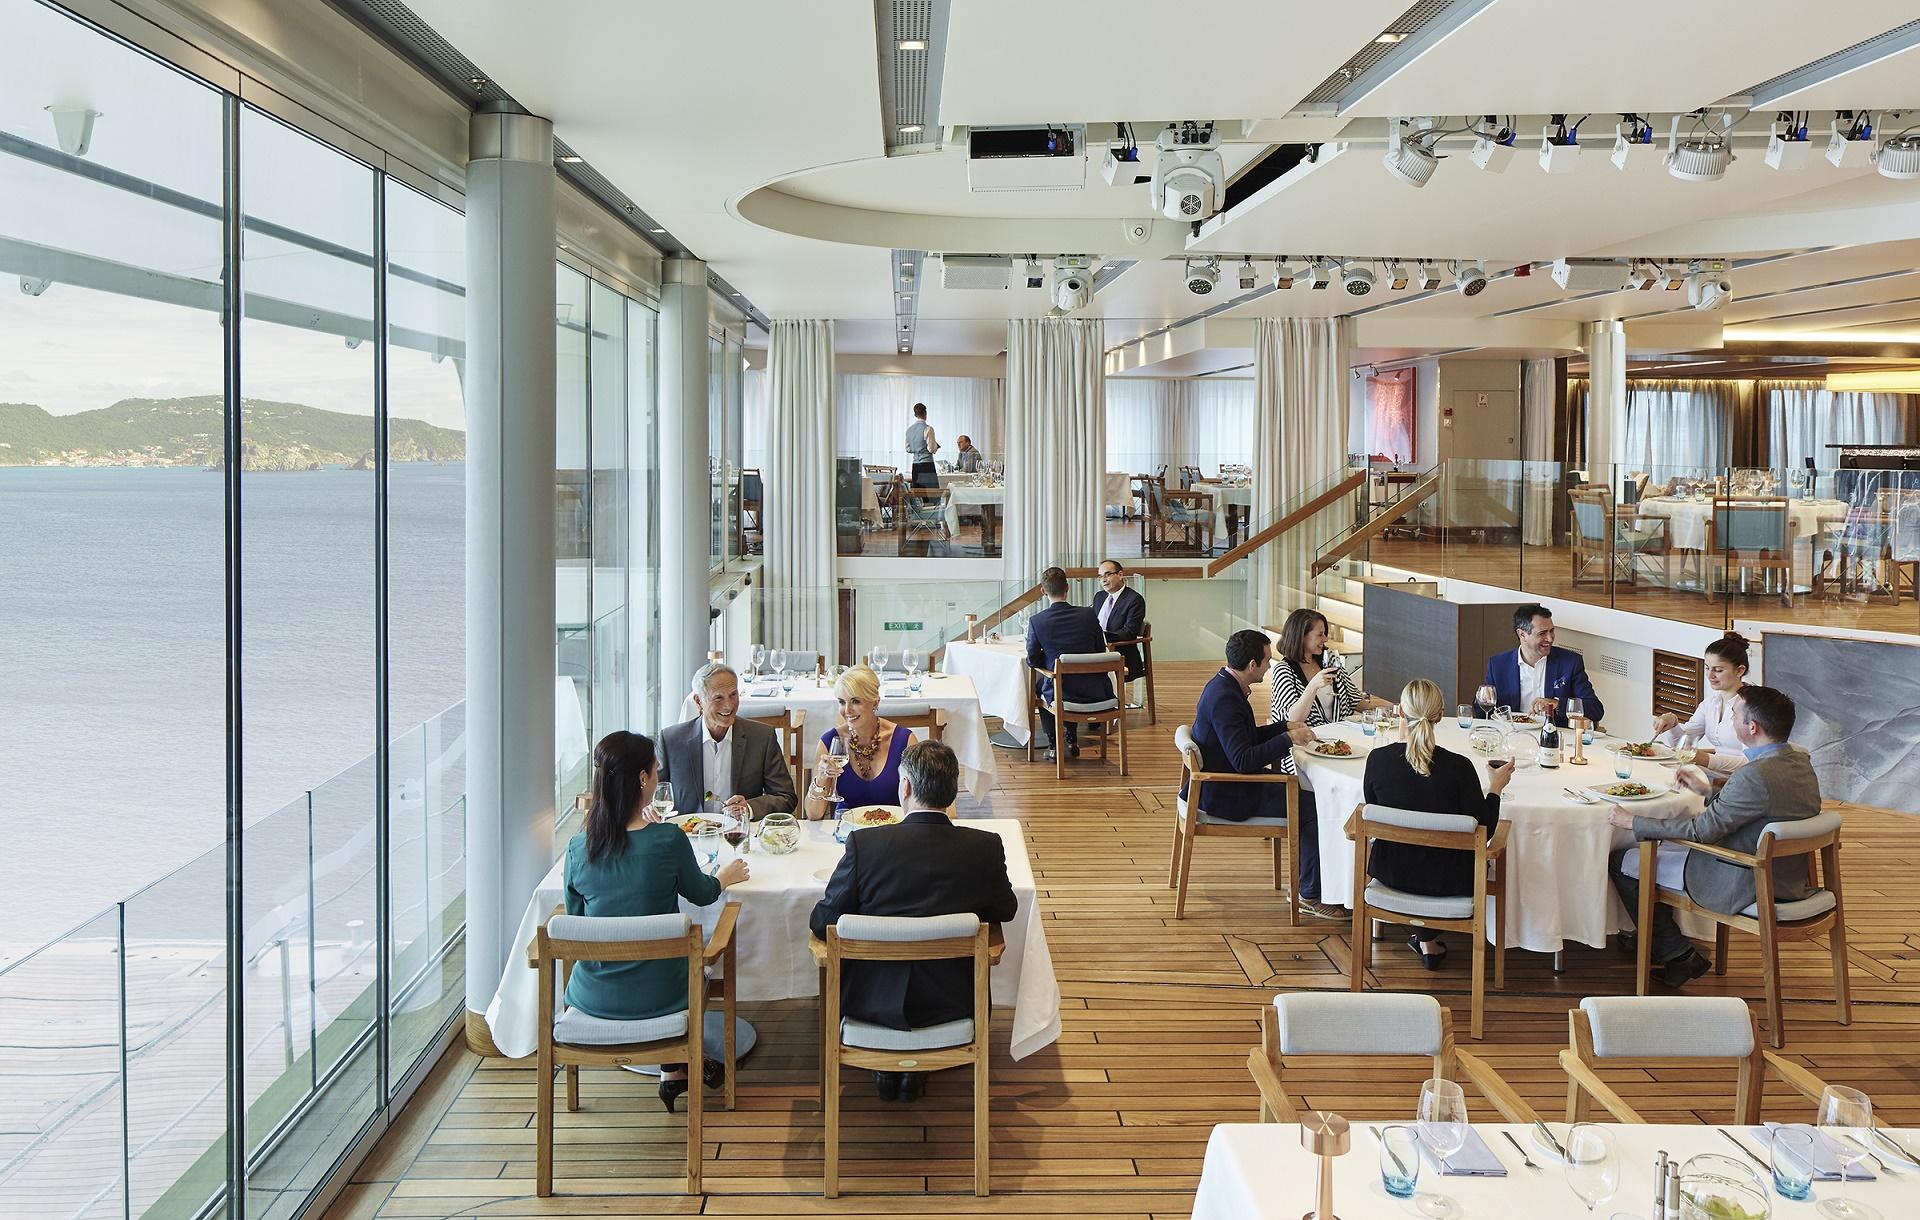 The World restaurant smal